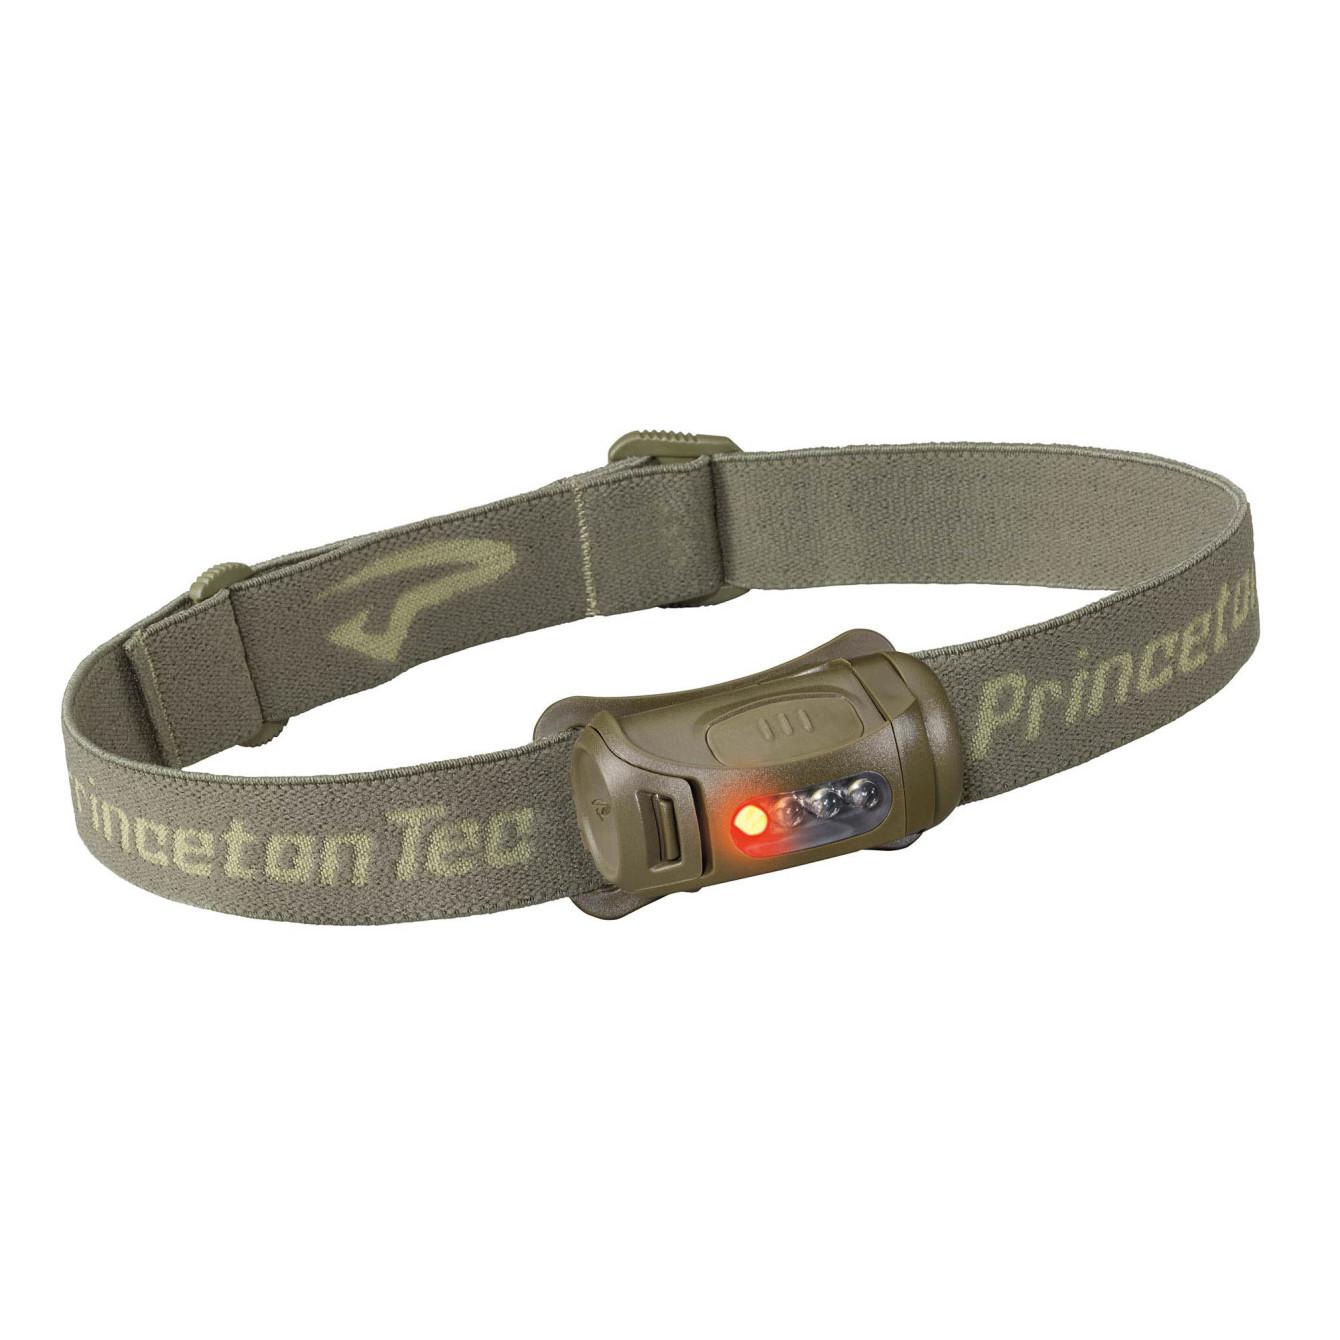 0077aec40a9 Taktikaline pealamp Princeton Tec Fred OD - Taivoster